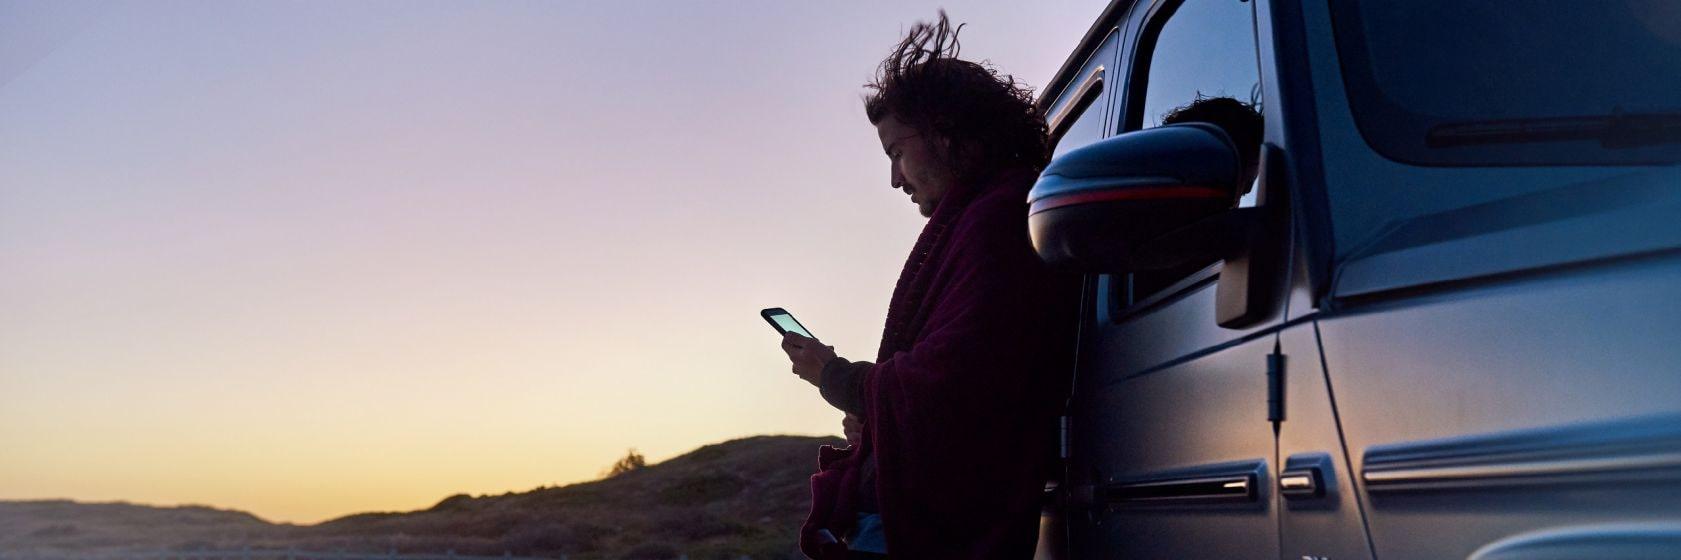 30 i hvilken sektor jobber de fleste i dagens norge billig smarttelefon med bra kamera